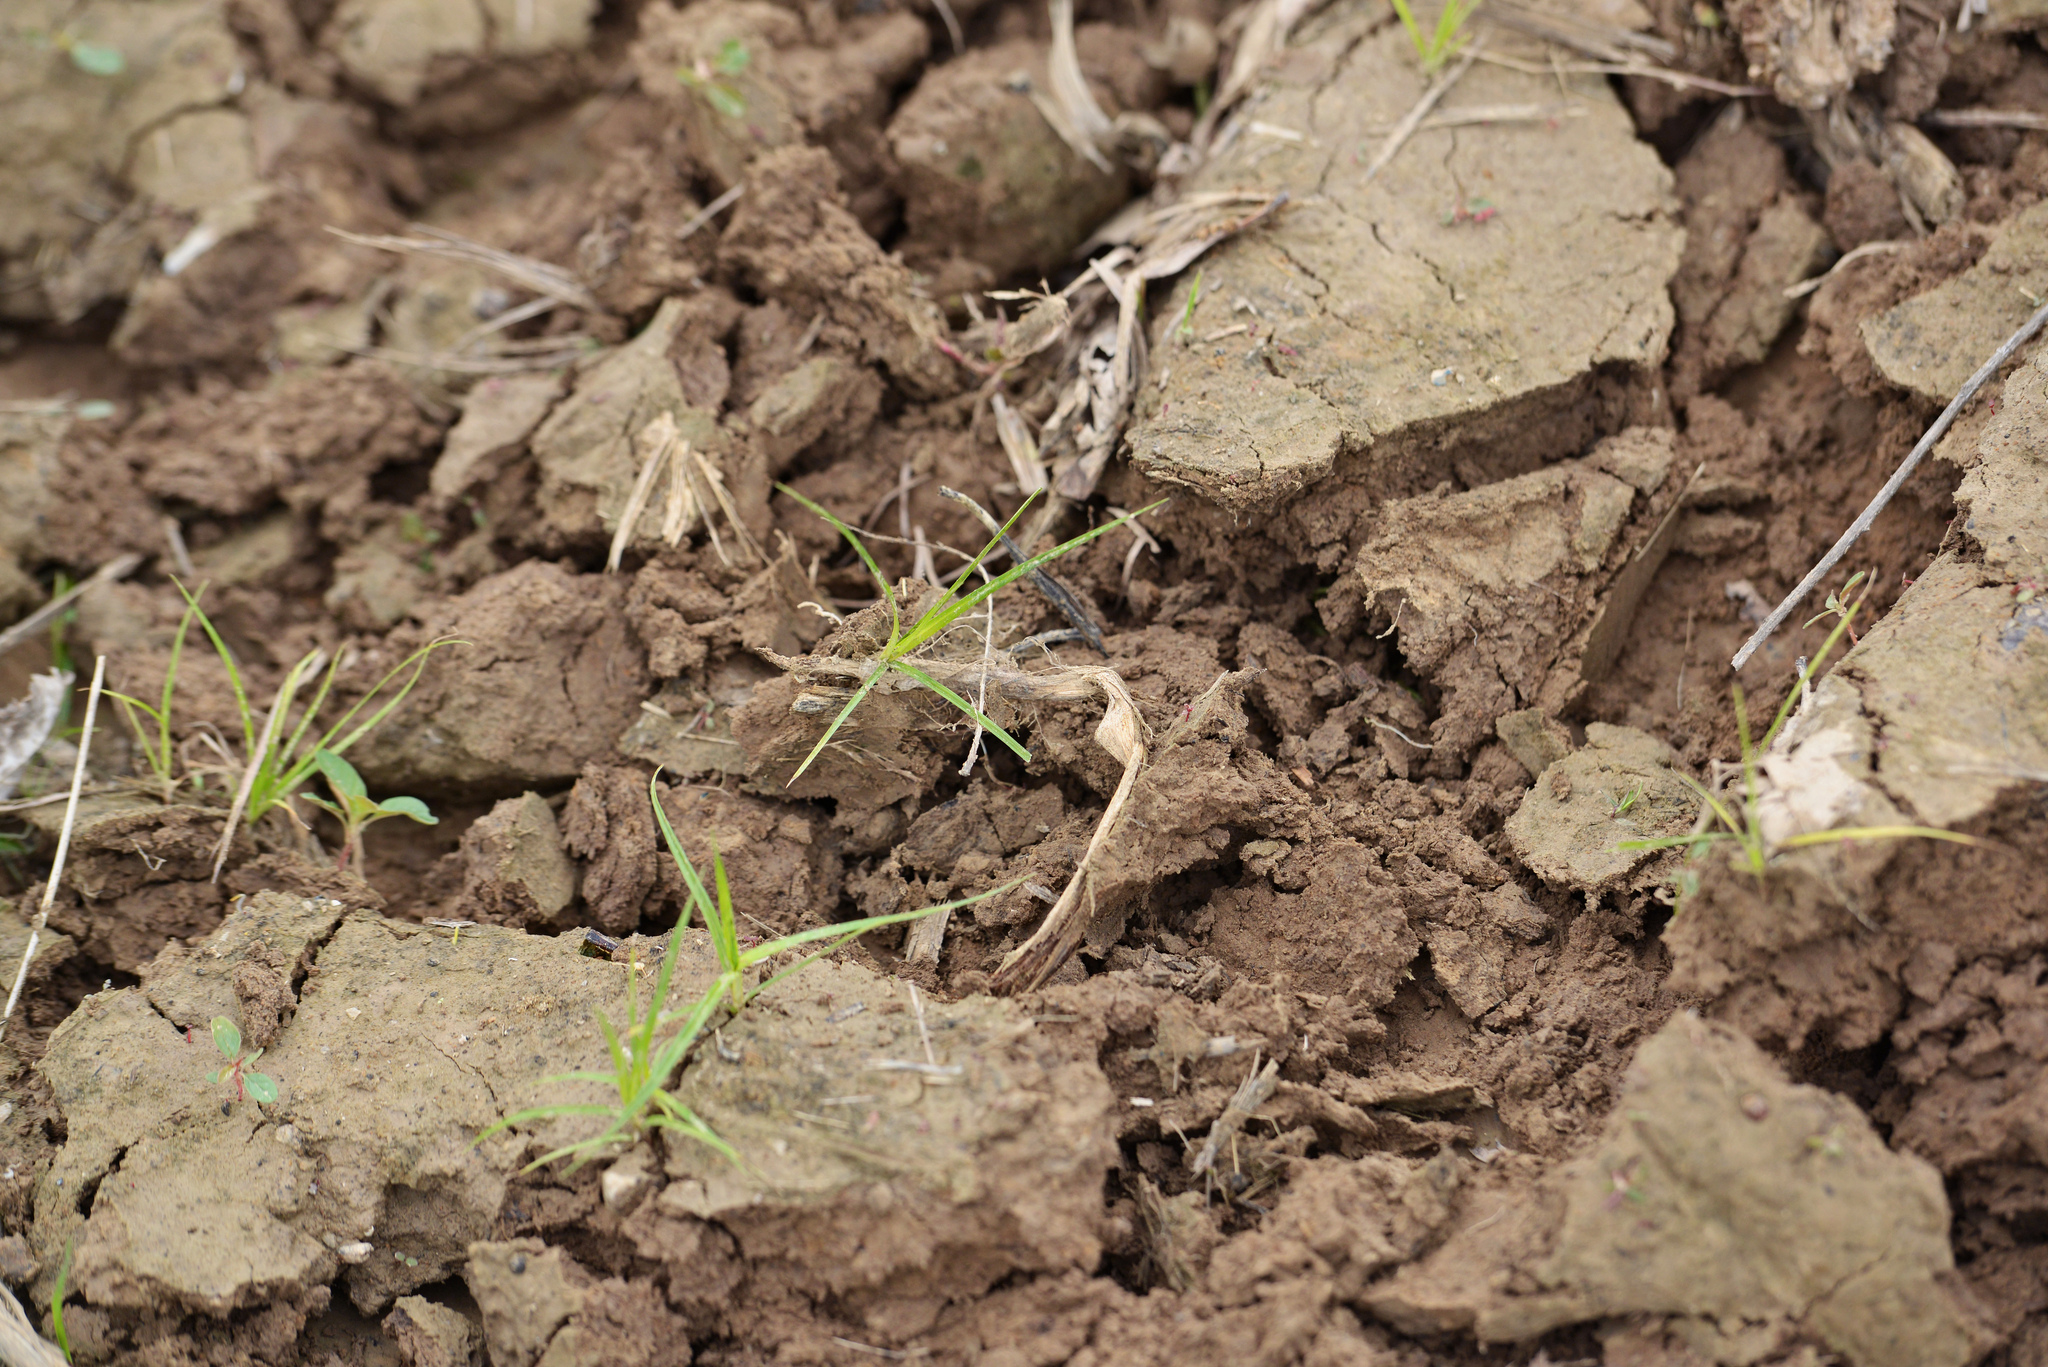 Image: United Soybean Board